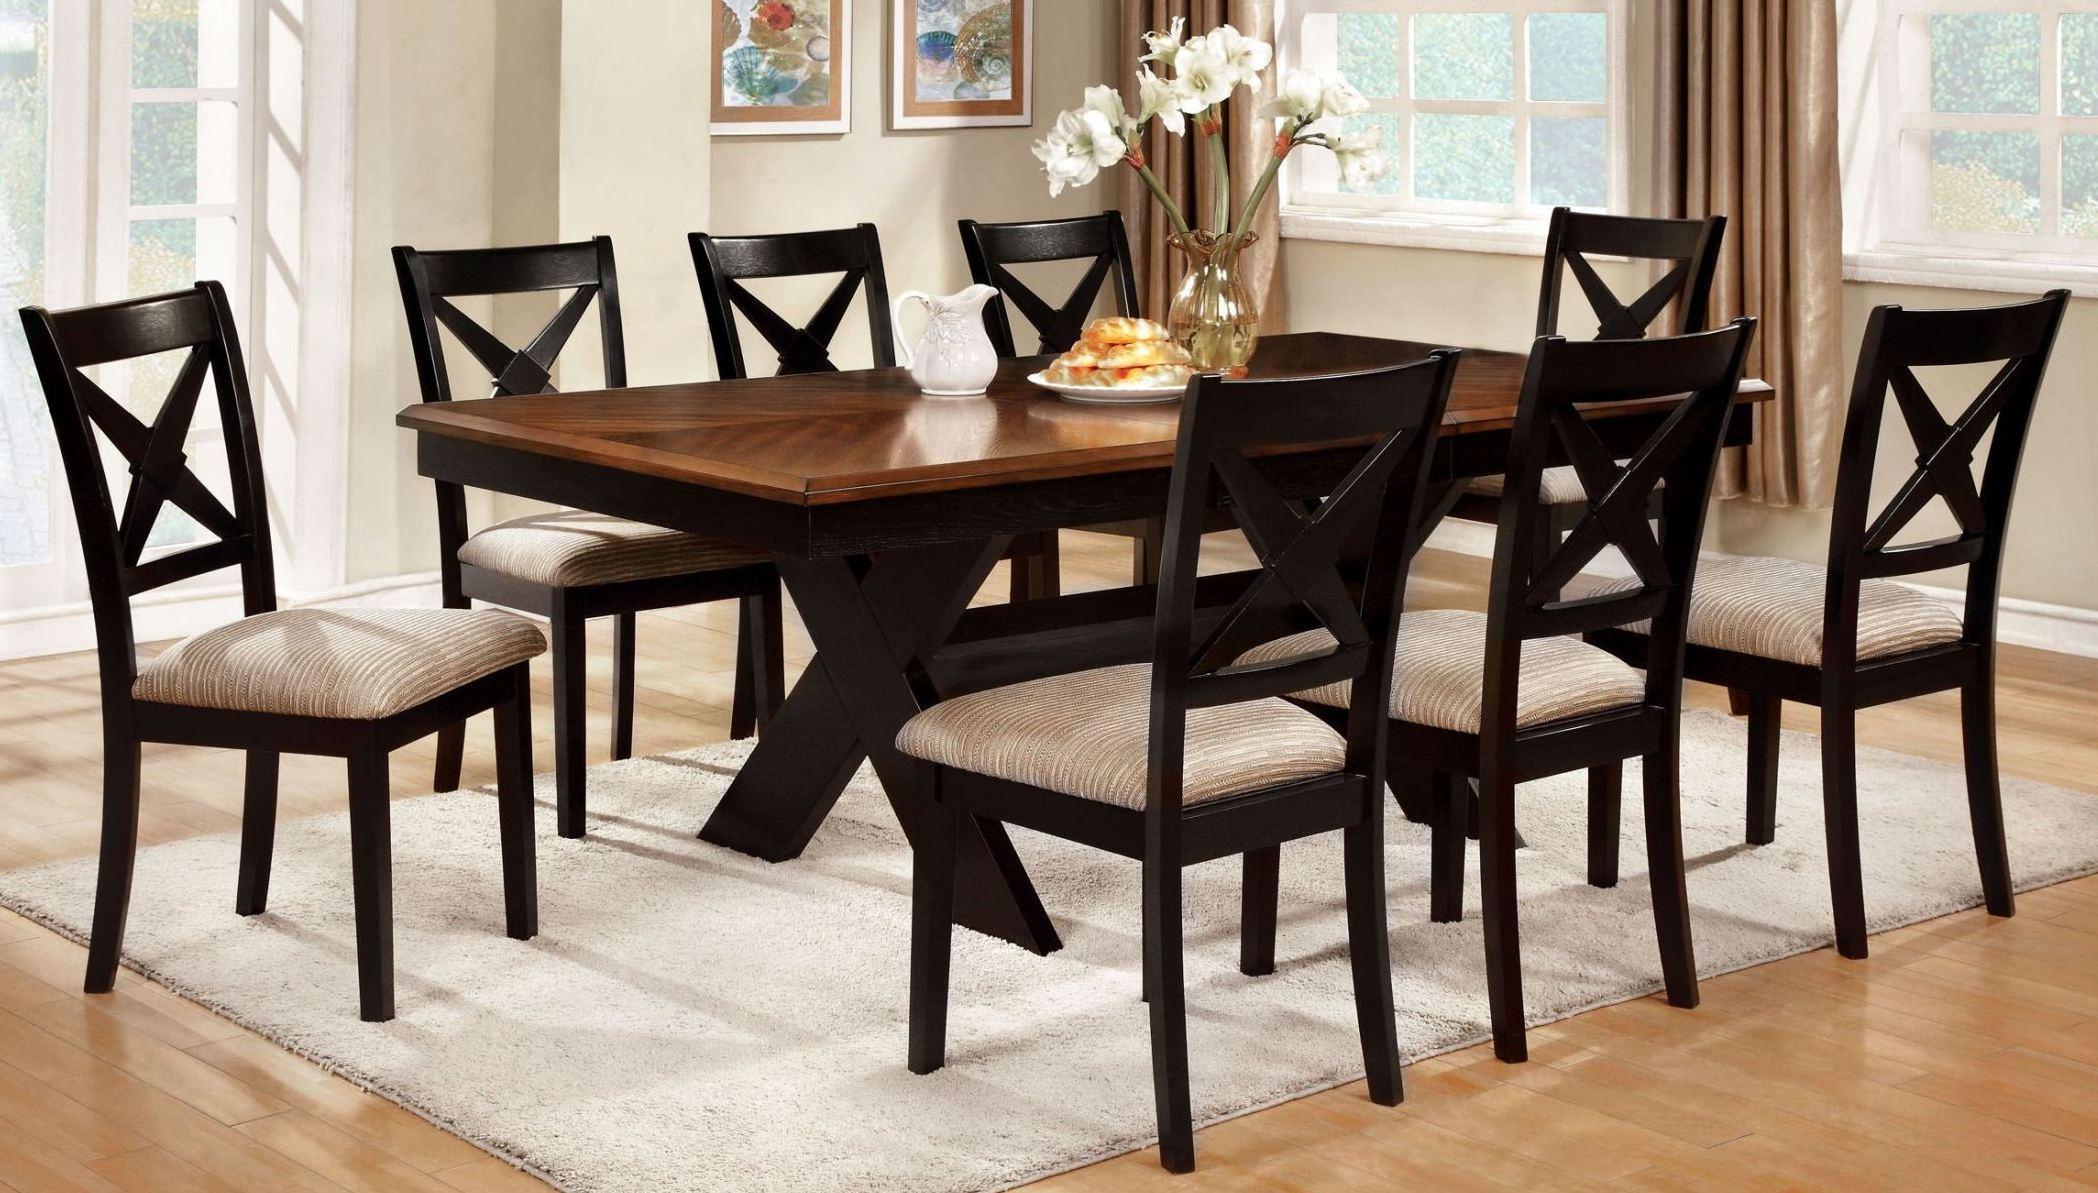 liberta dark oak rectangular trestle dining room set from furniture of america cm3776t table. Black Bedroom Furniture Sets. Home Design Ideas